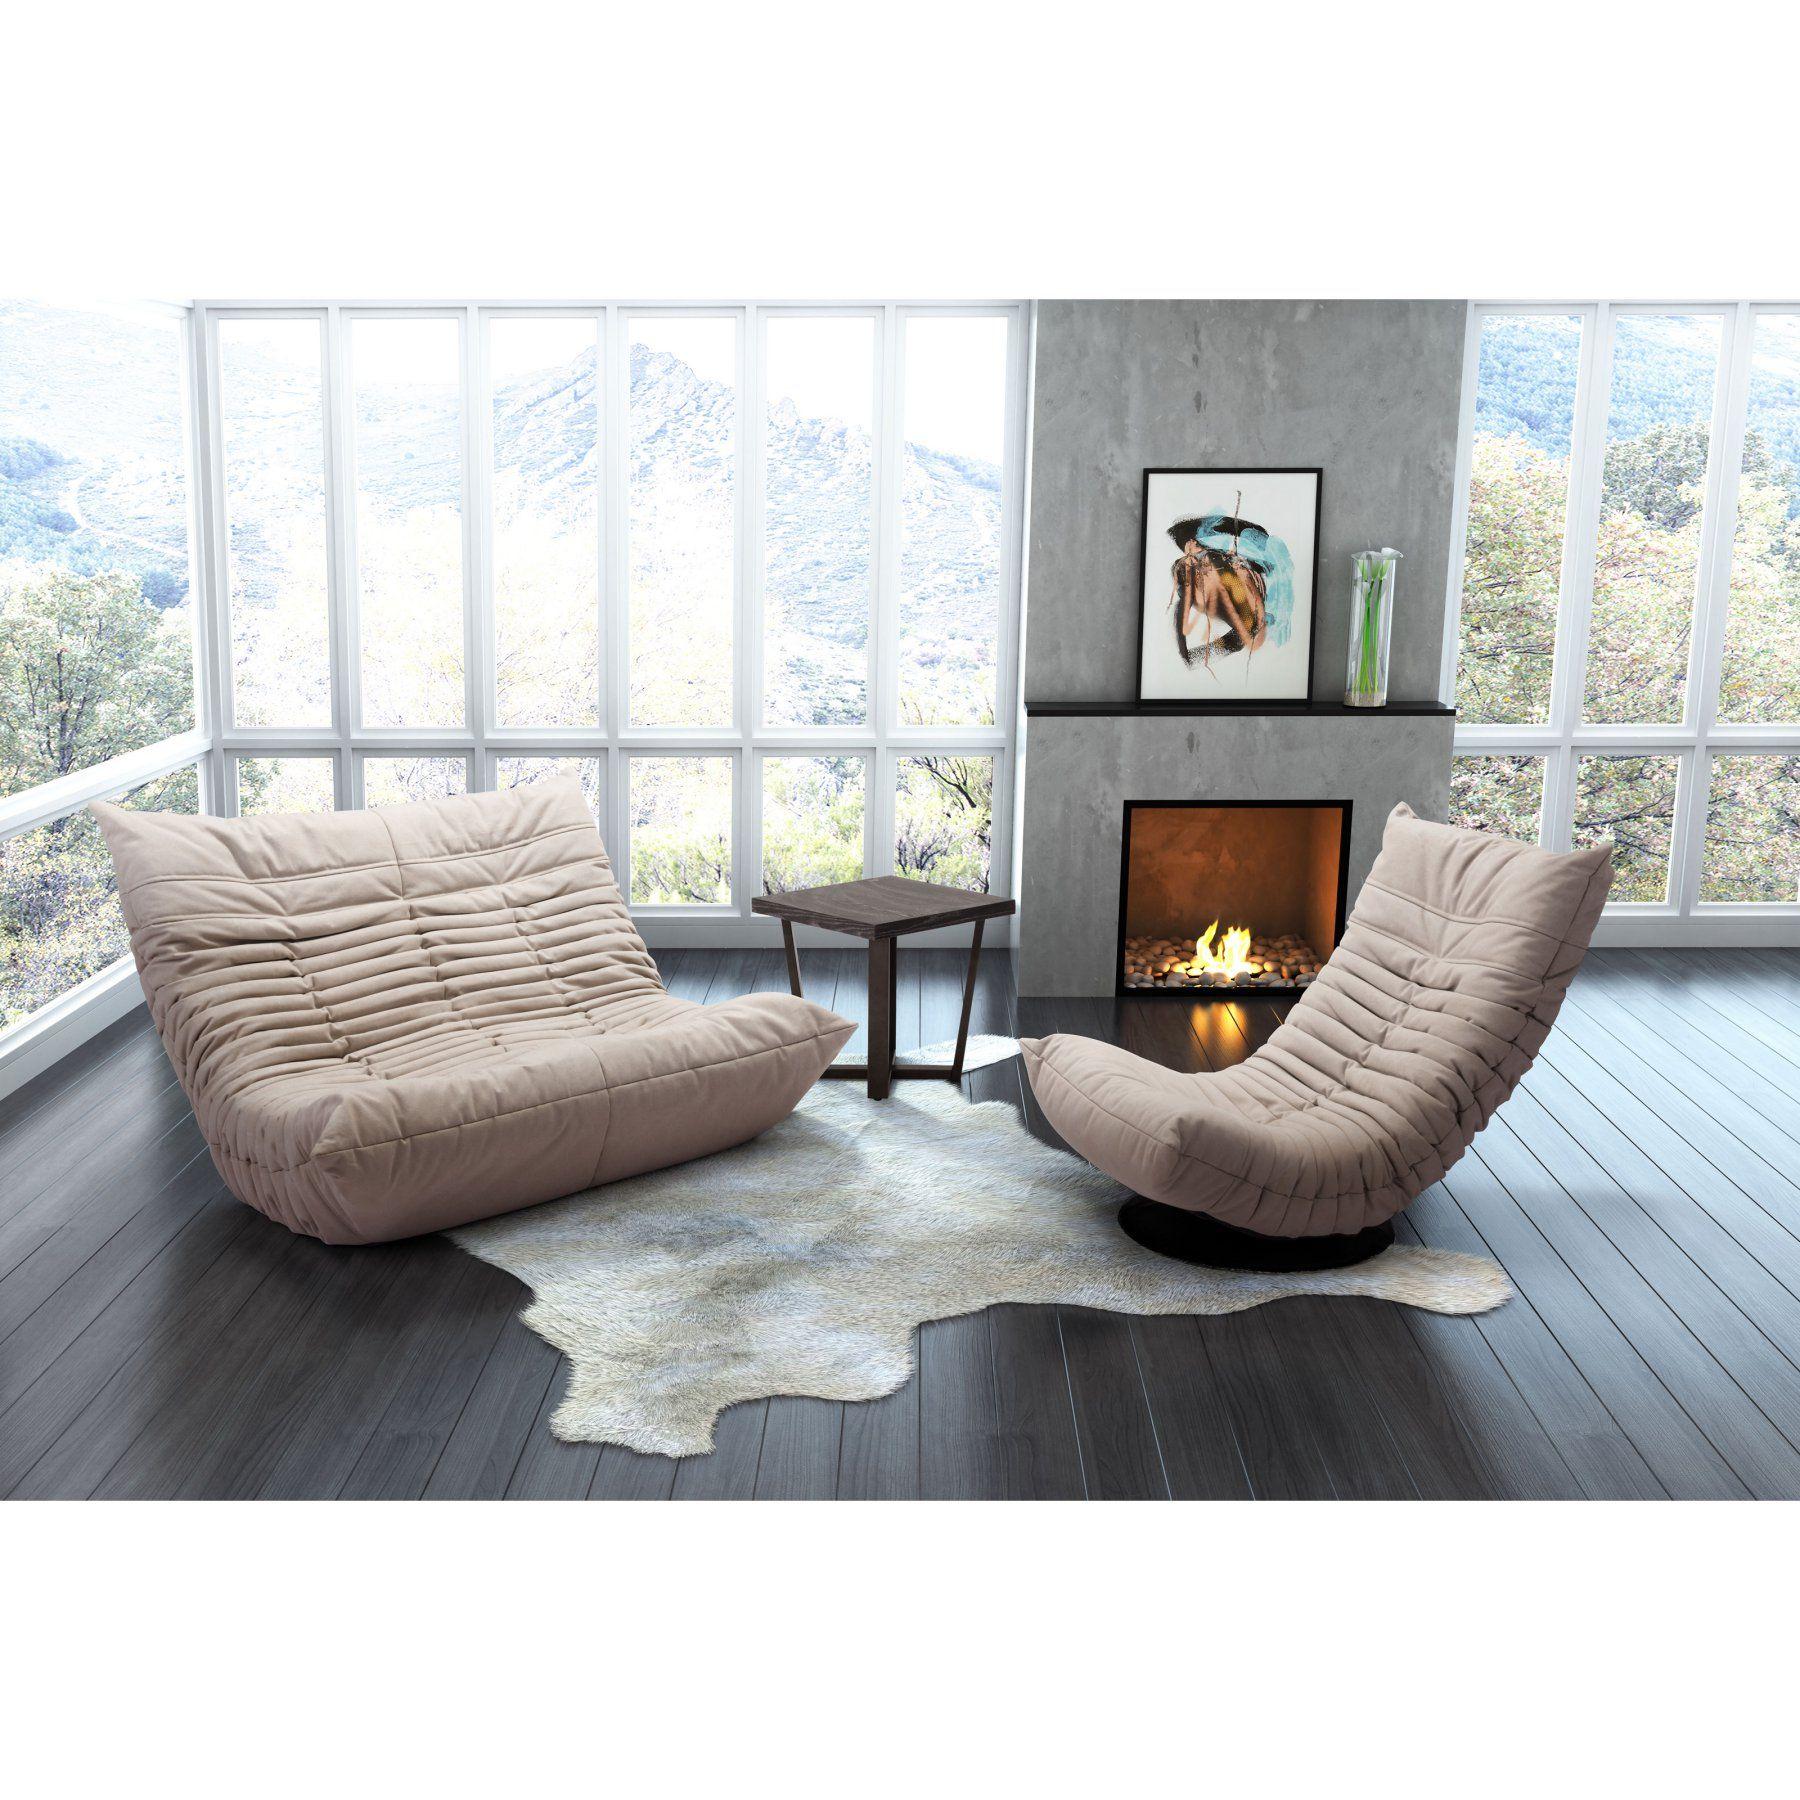 Pleasing Zuo Modern Contemporary Down Low Swivel Chair 100682 Inzonedesignstudio Interior Chair Design Inzonedesignstudiocom